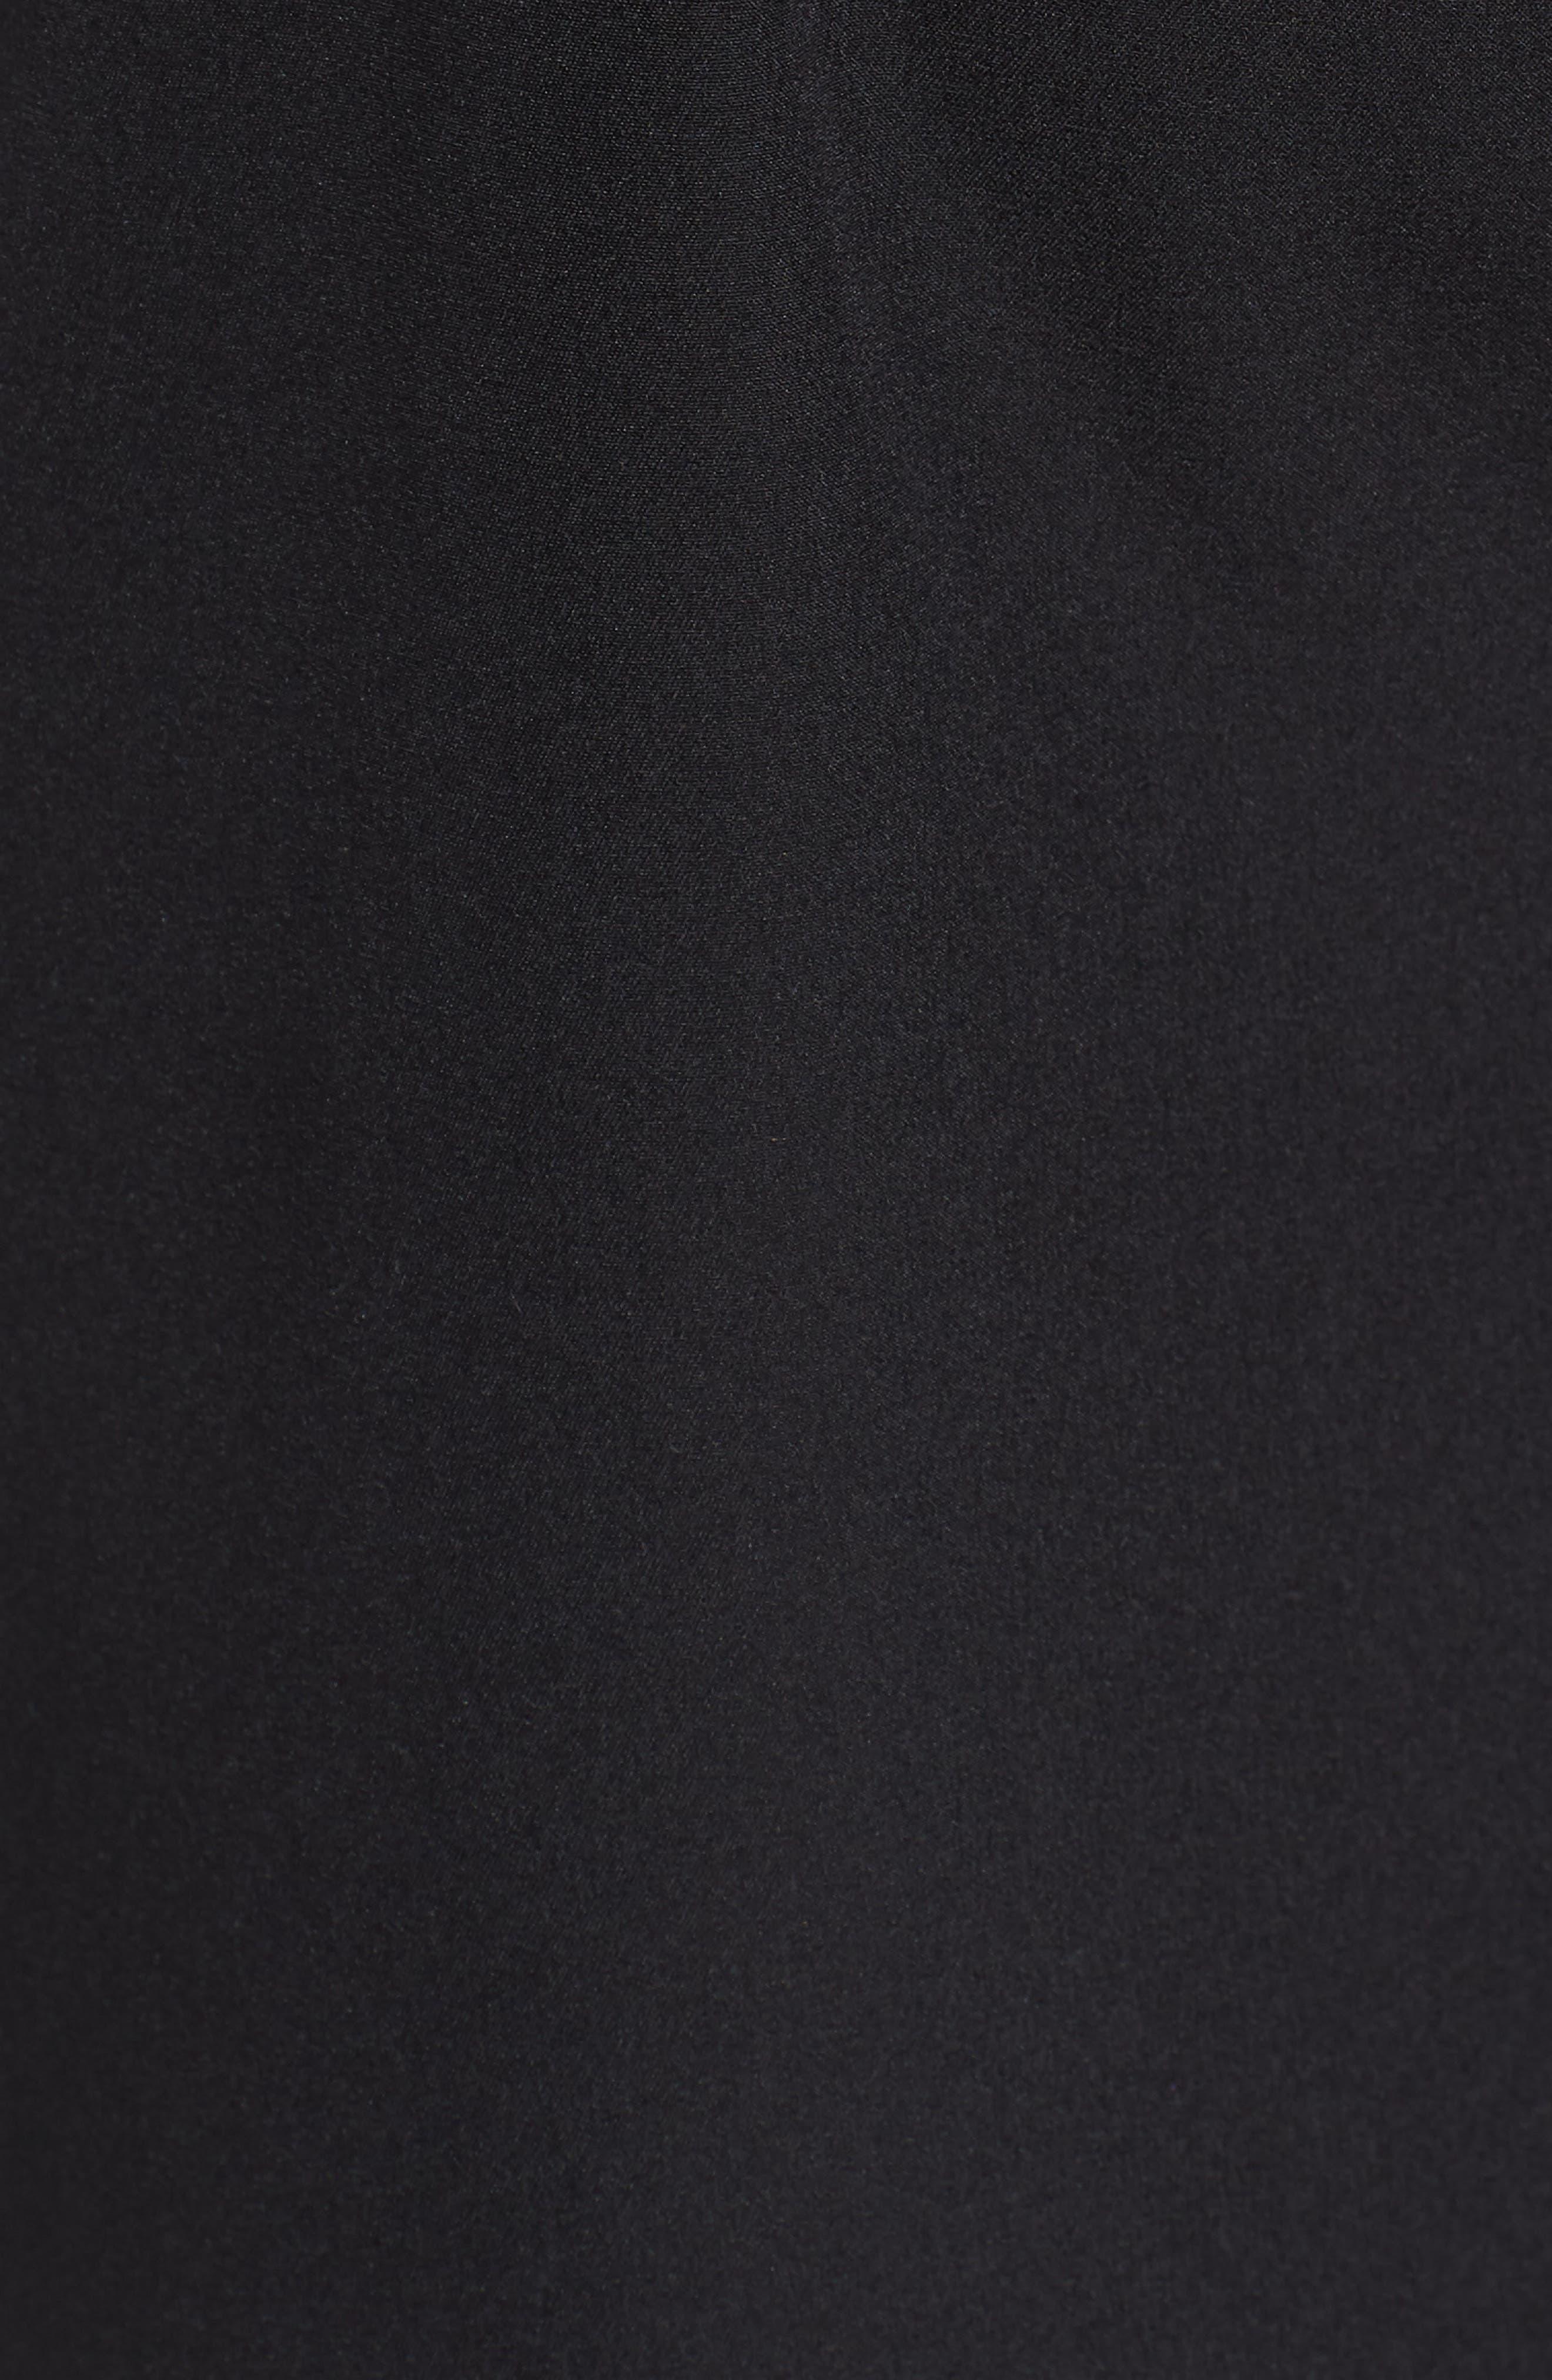 Superfreak Board Shorts,                             Alternate thumbnail 5, color,                             001